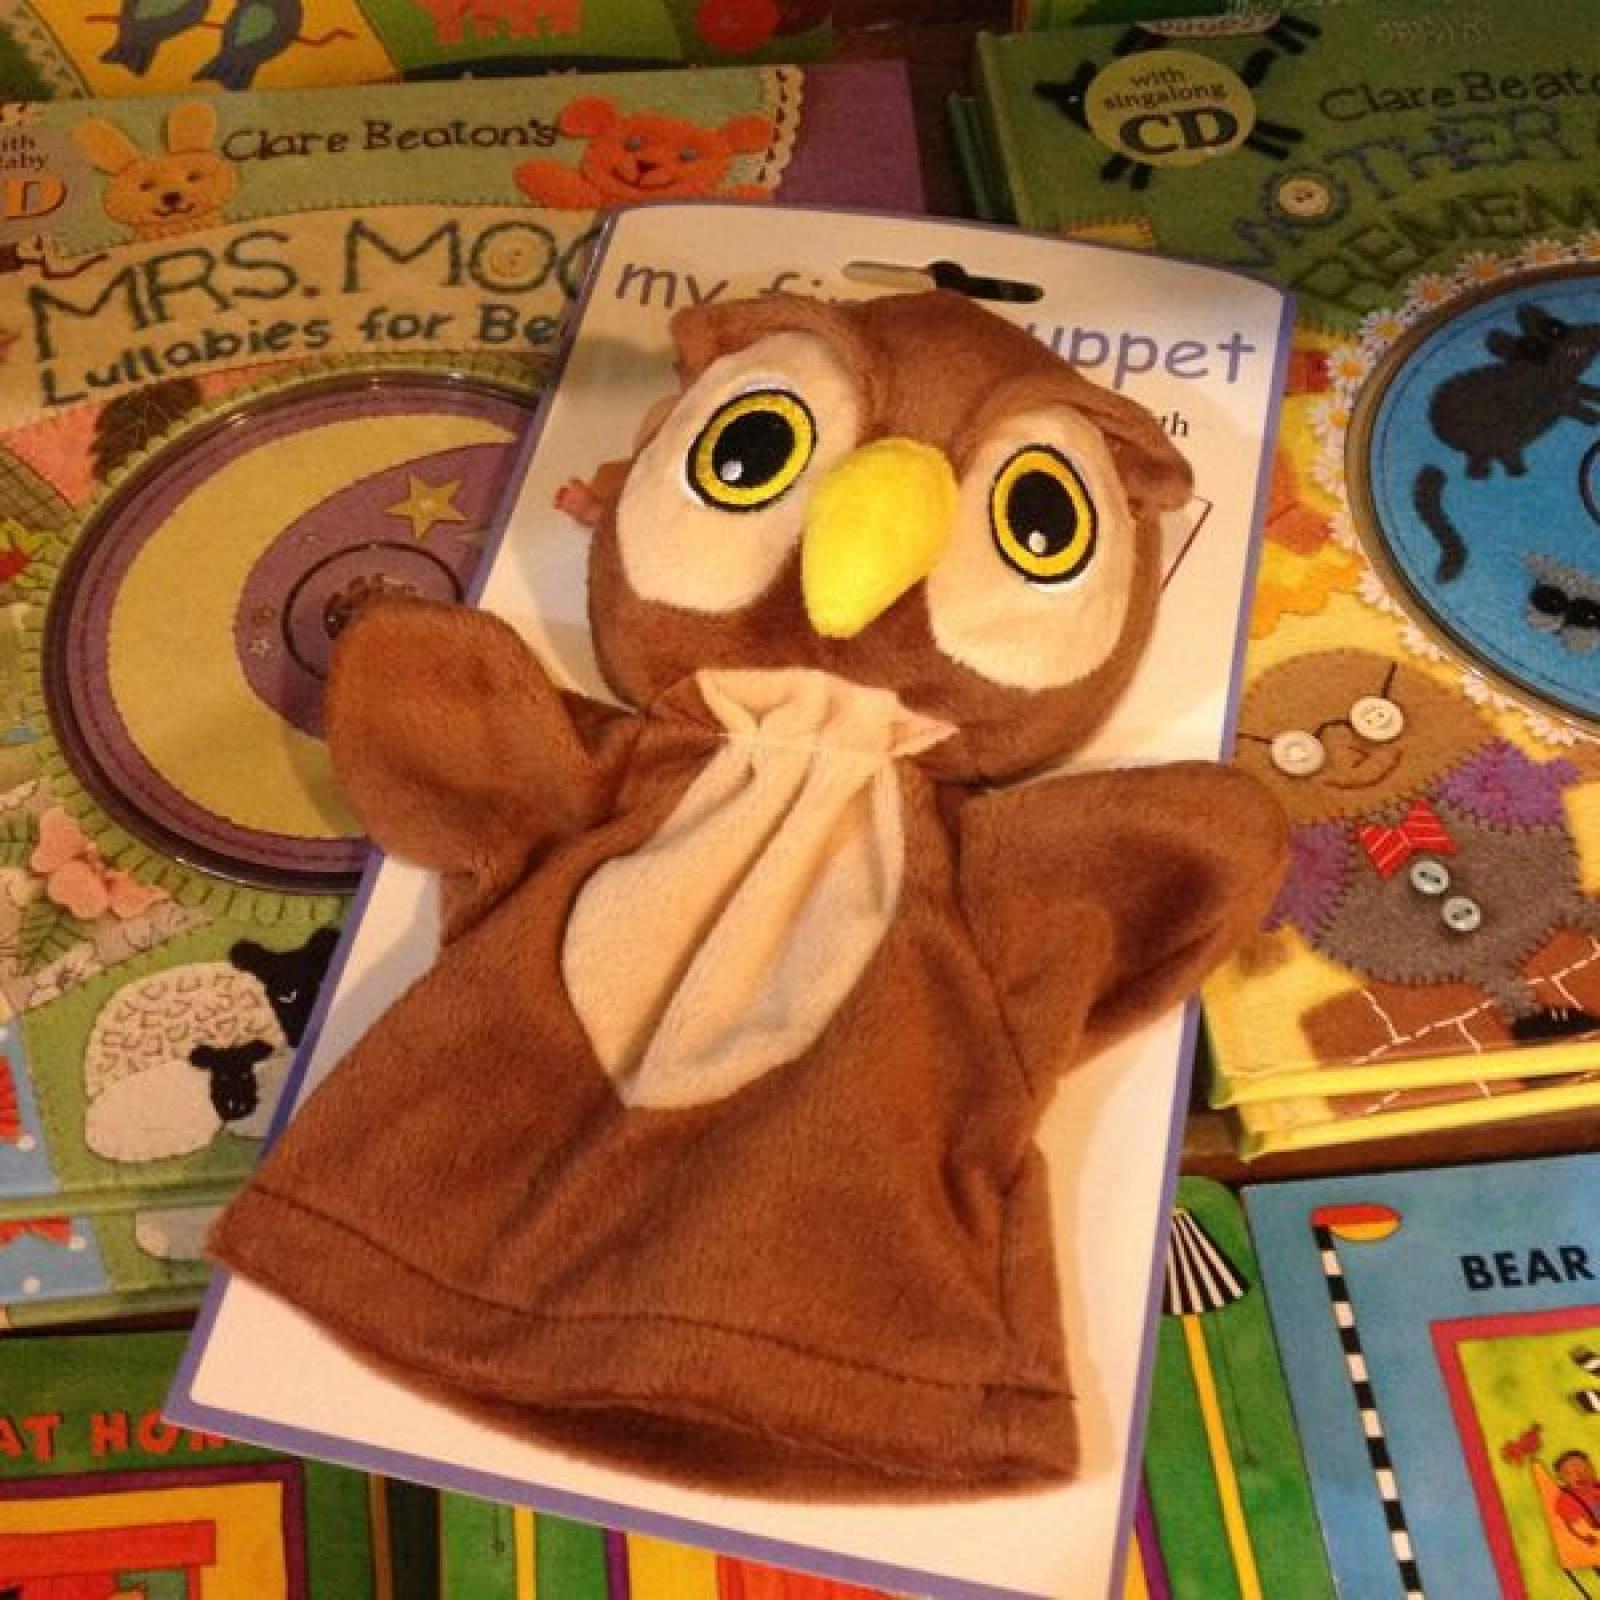 Owl My First Puppet 0yrs+